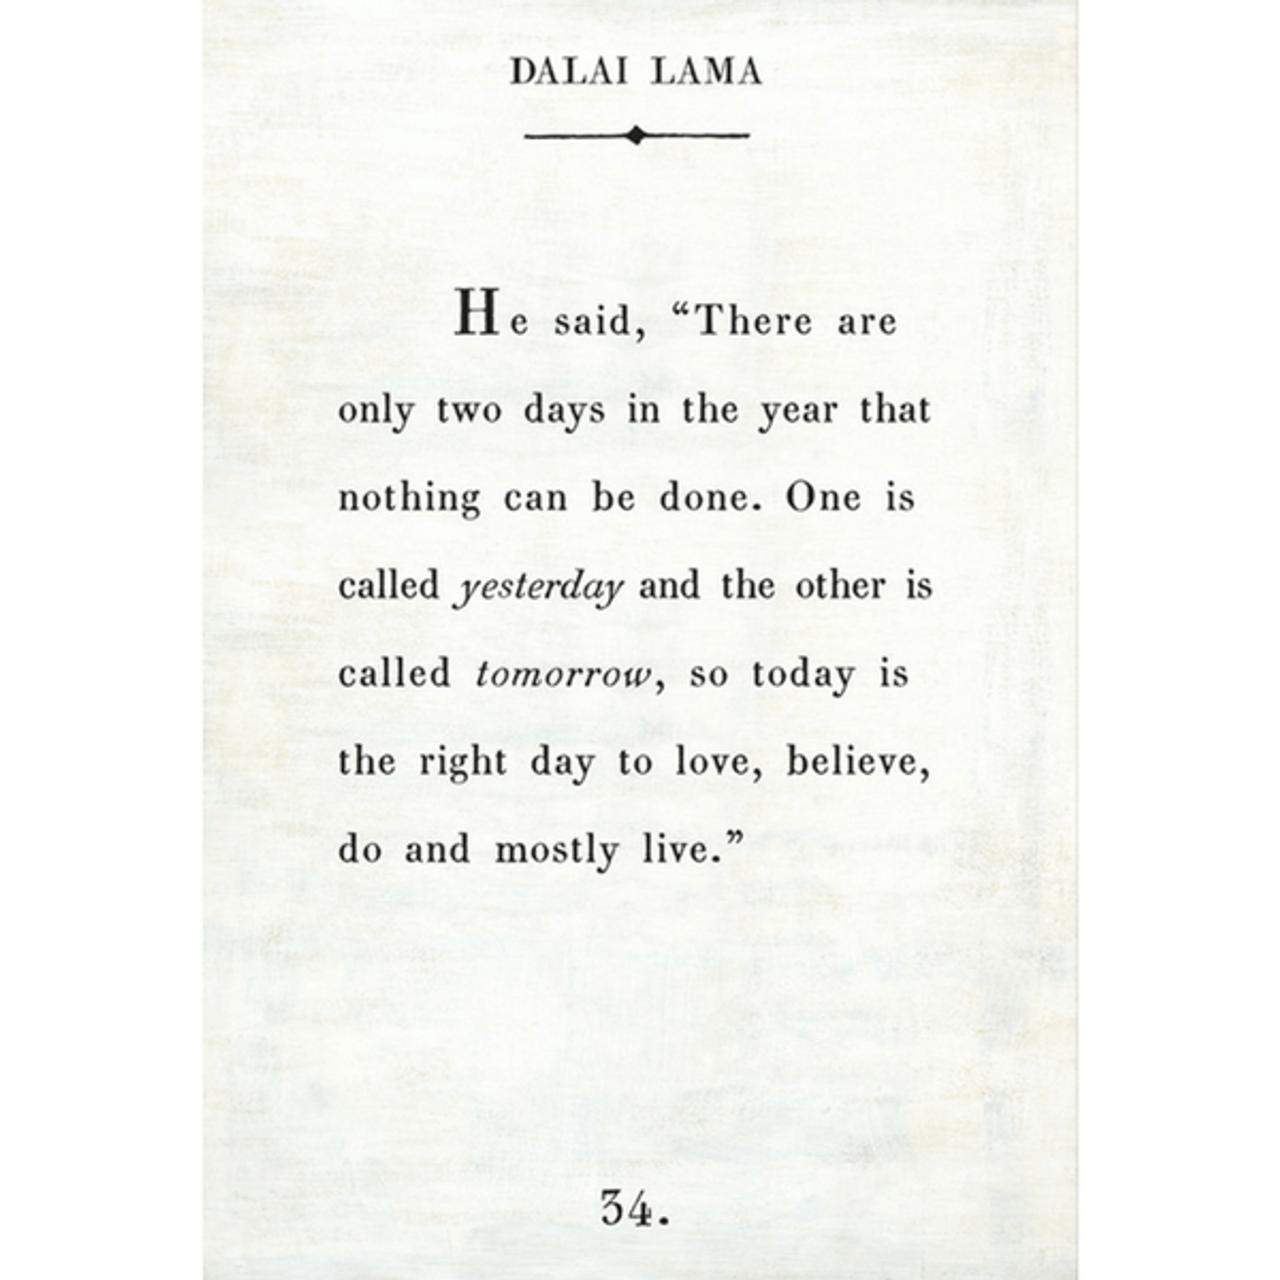 dalai lama art print - white with gallery wrap frame